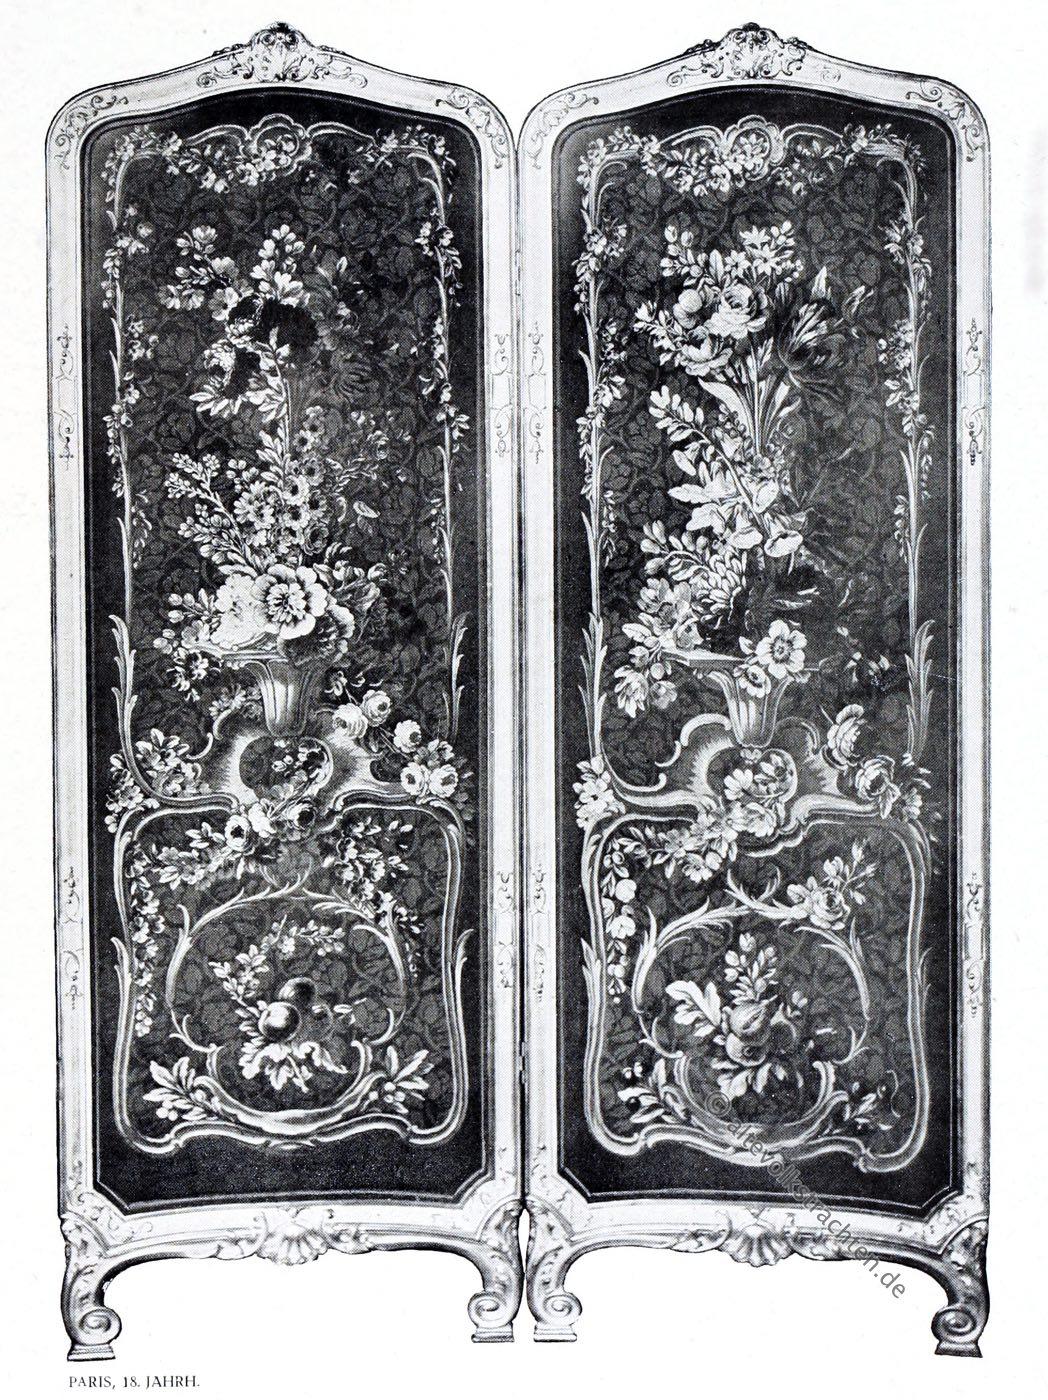 Gobelin, Barock, Möbel, Paravent, Kunsthistorie, Gobelinsammlung, Gobelins, 18. Jahrhundert,